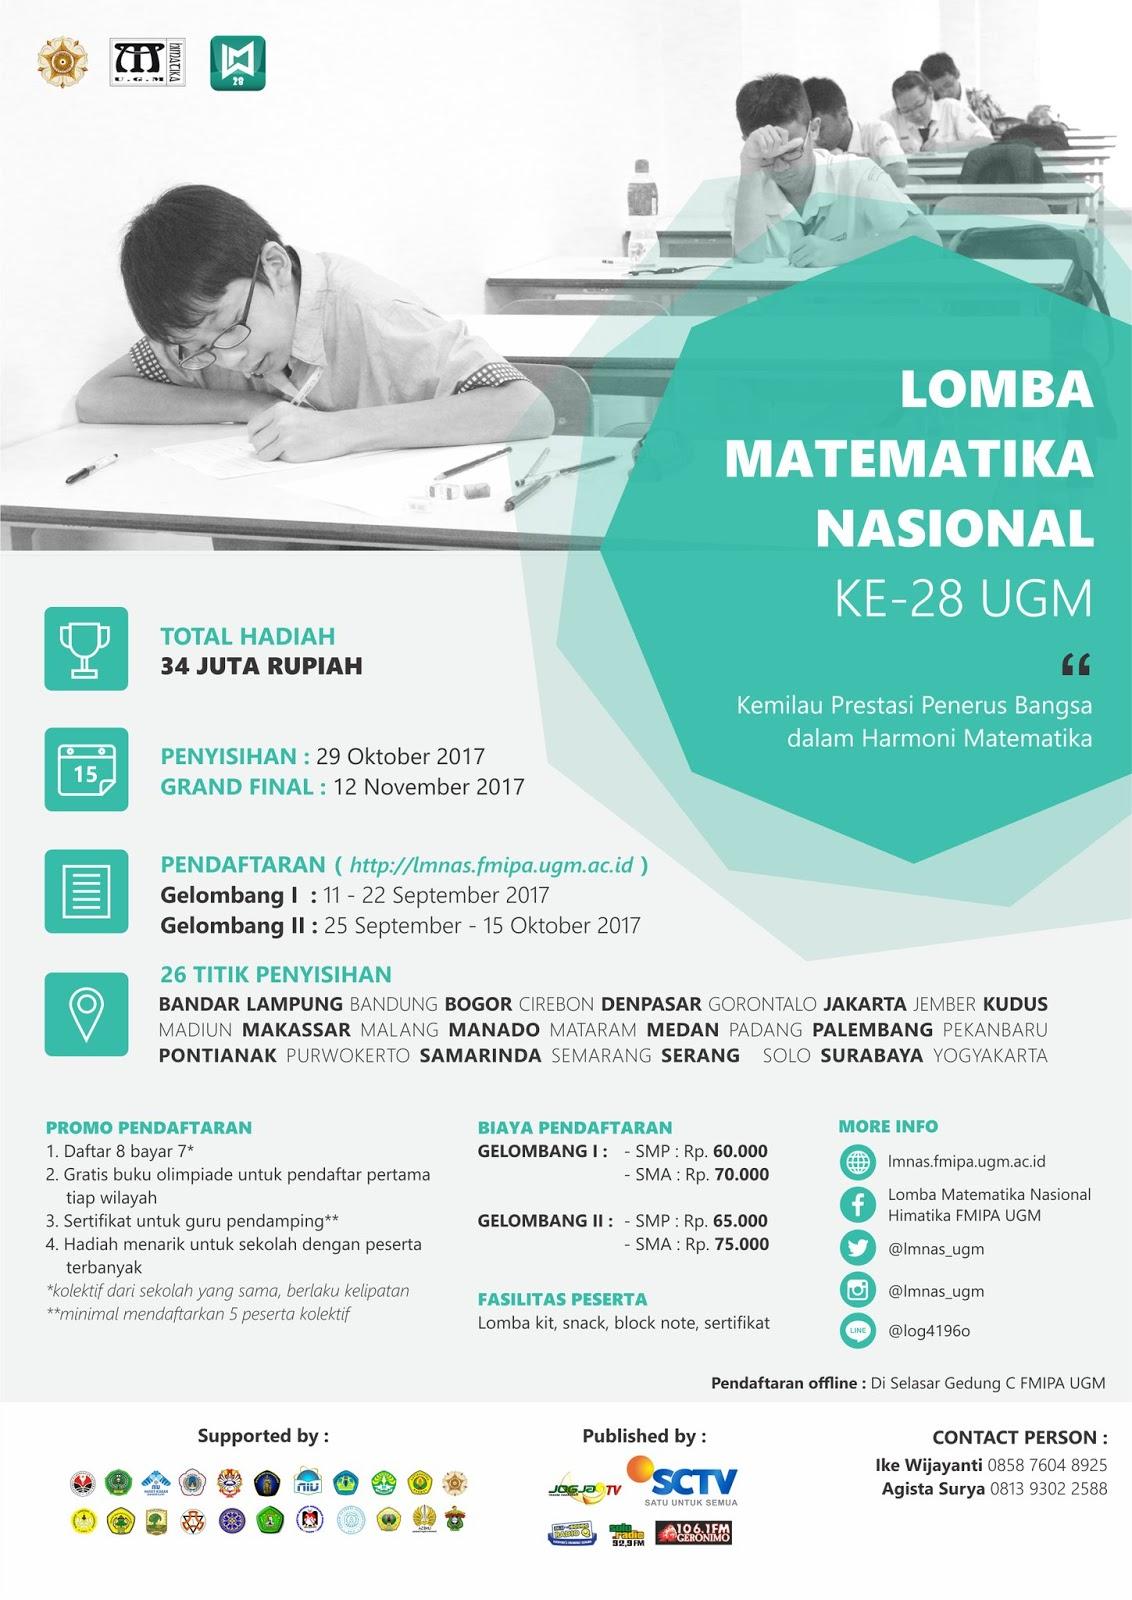 Lomba Matematika Nasional UGM